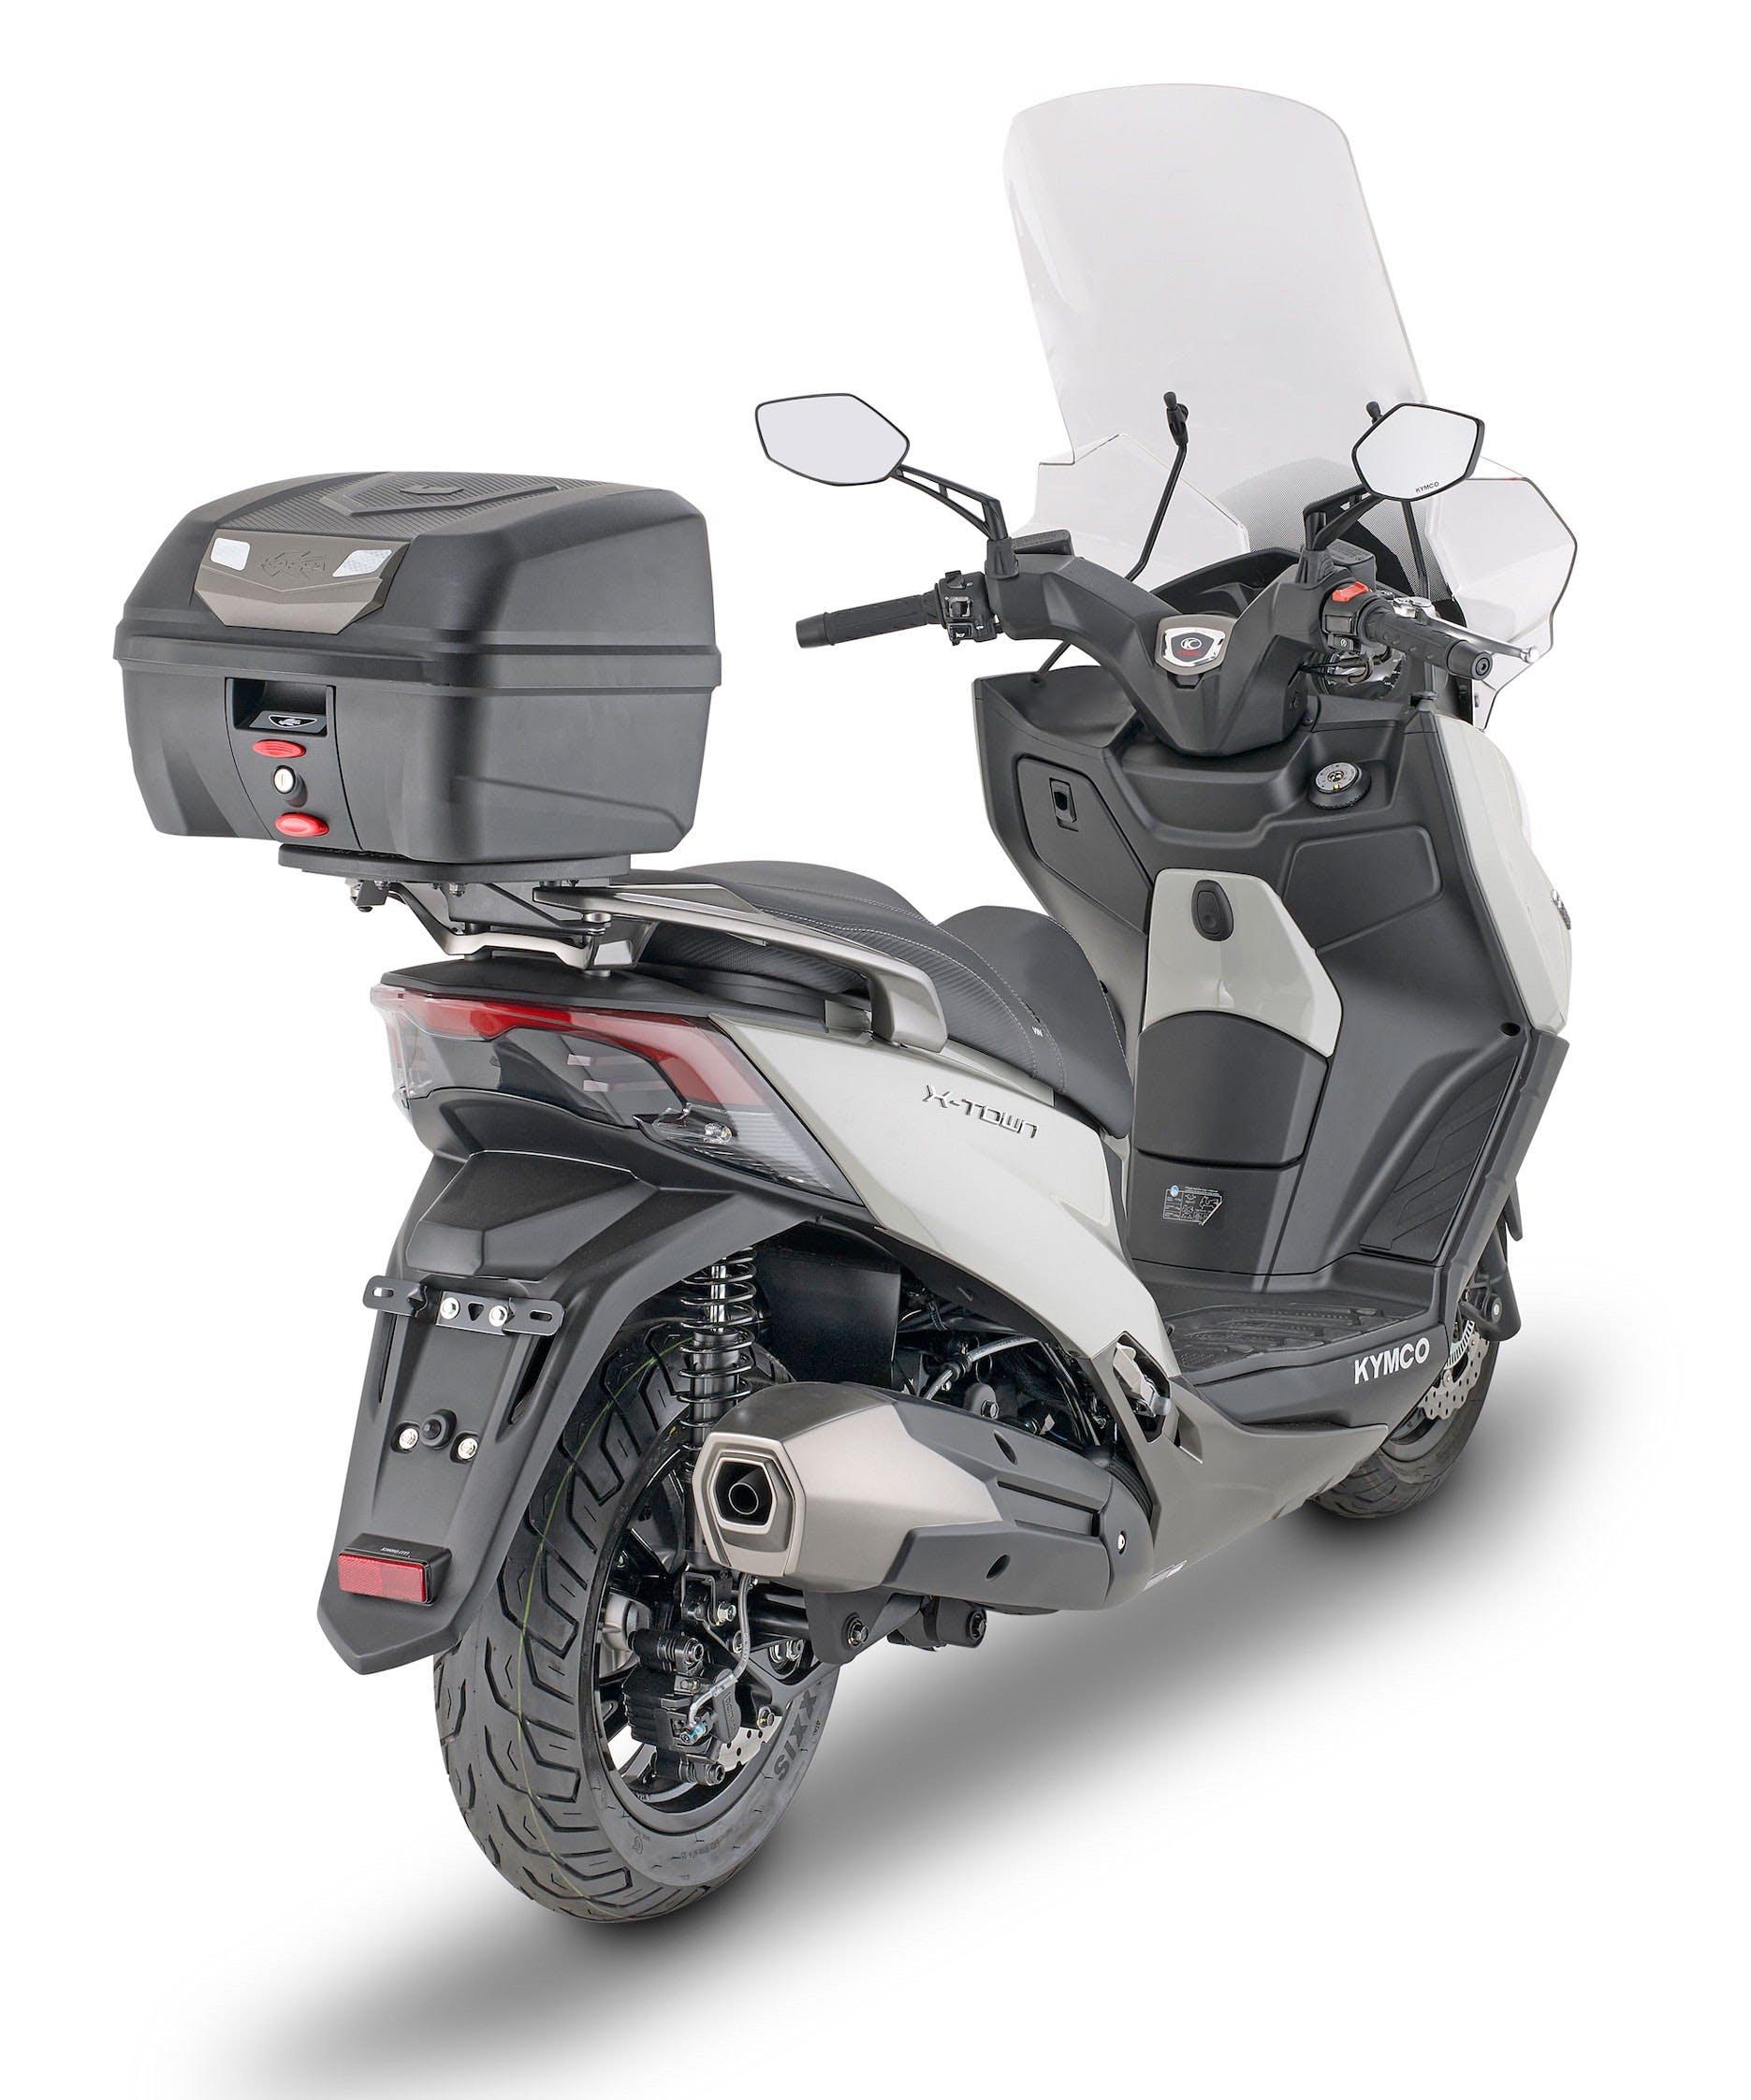 Bauletto Kappa Cube K320N montato su scooter.